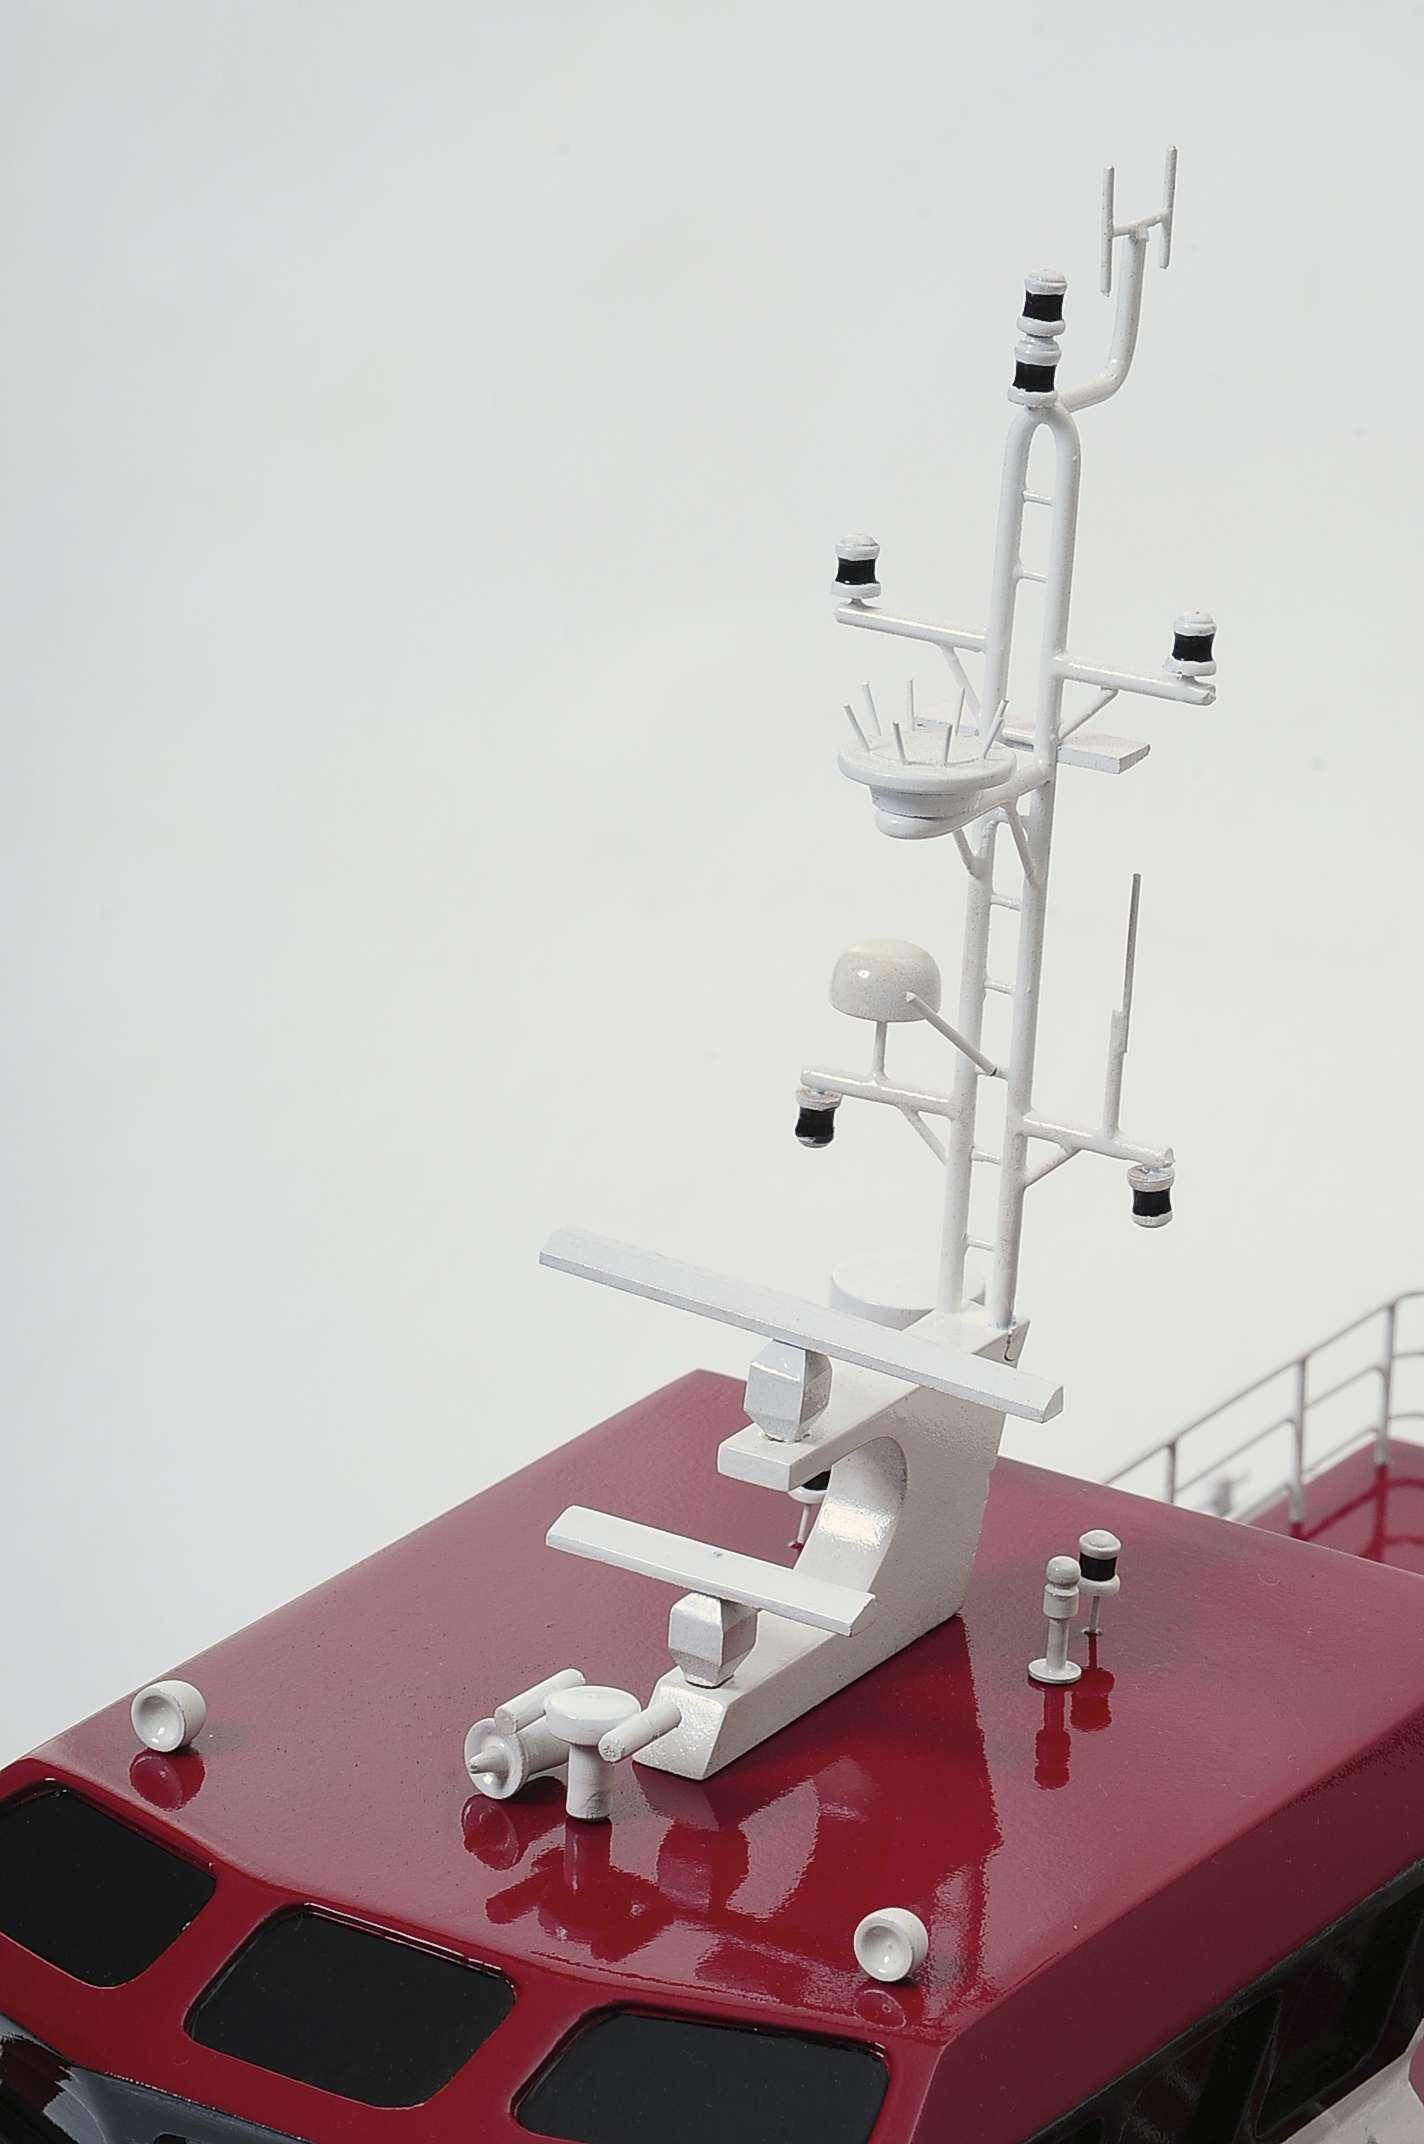 1439-4943-Turbine-Transfer-Catamaran-Model